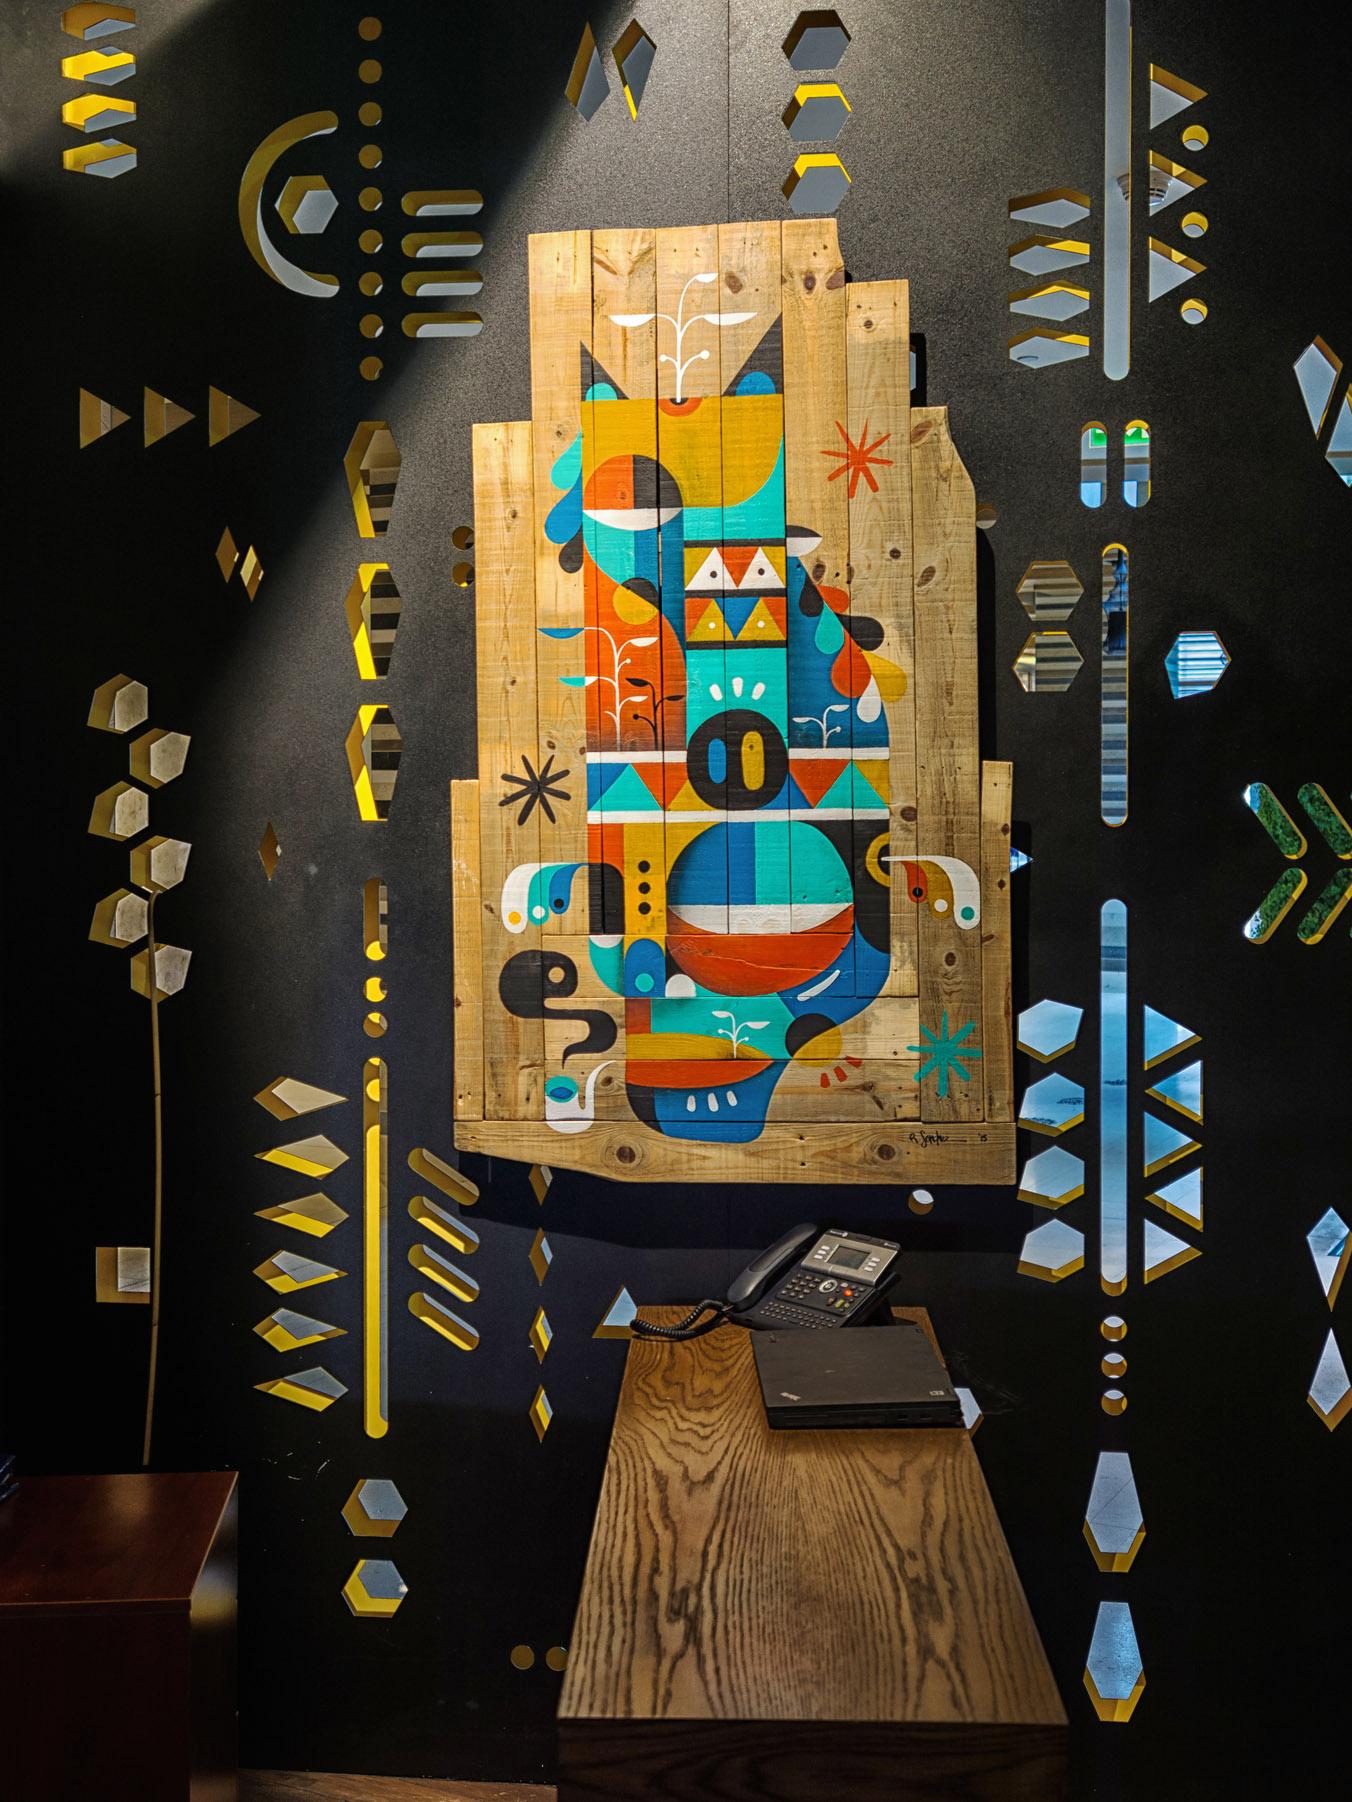 09-capsule-arts-projects-tablita-ruben.jpg